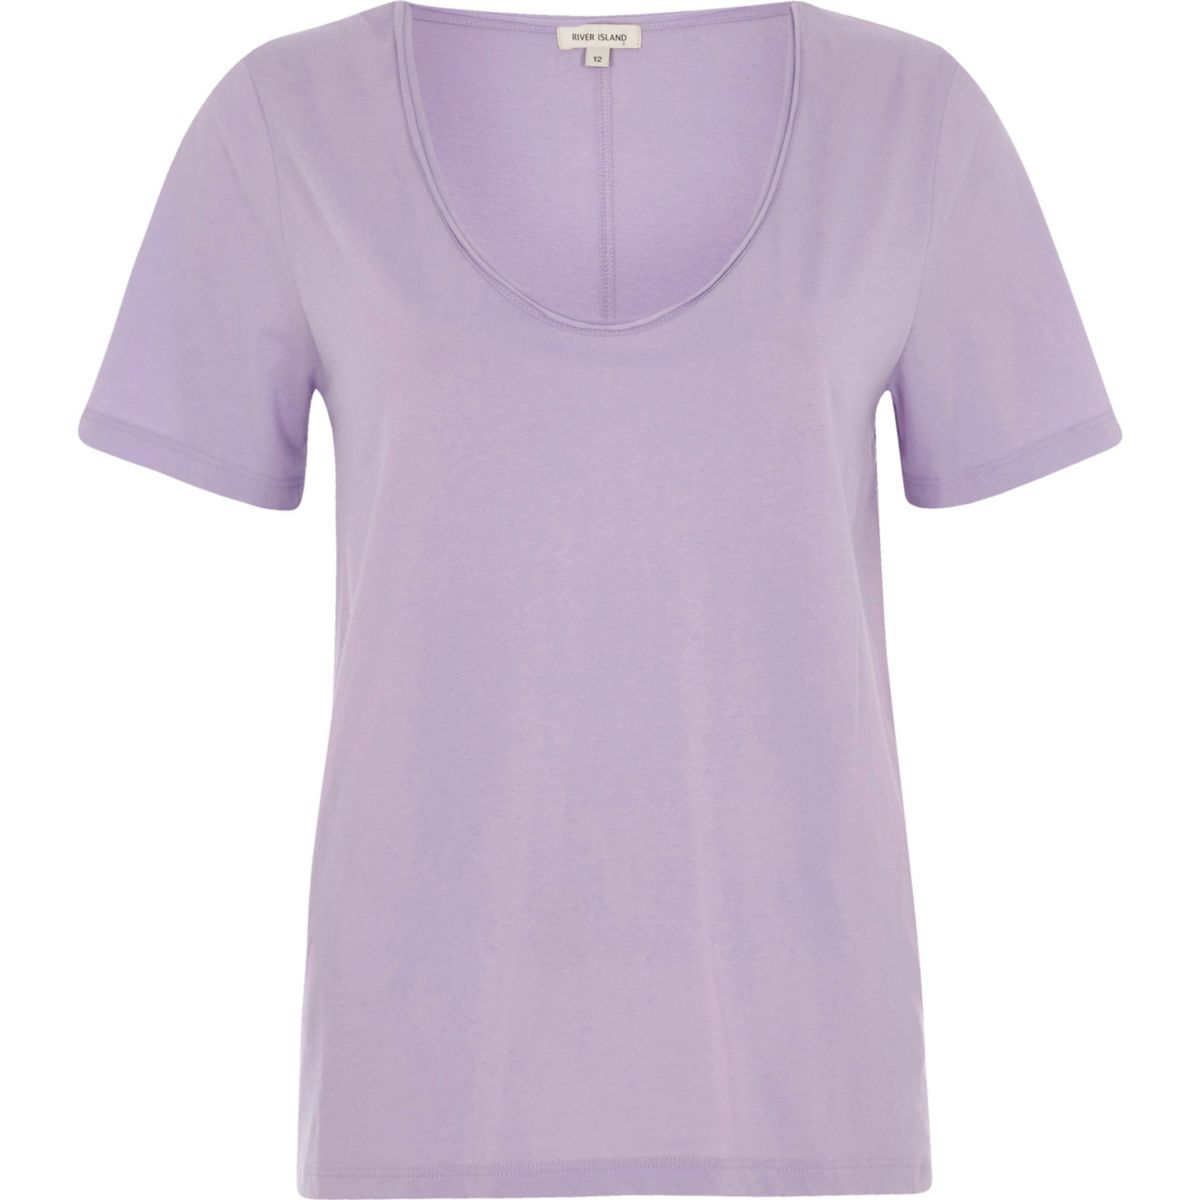 T-Shirt in Lila mit U-Ausschnitt